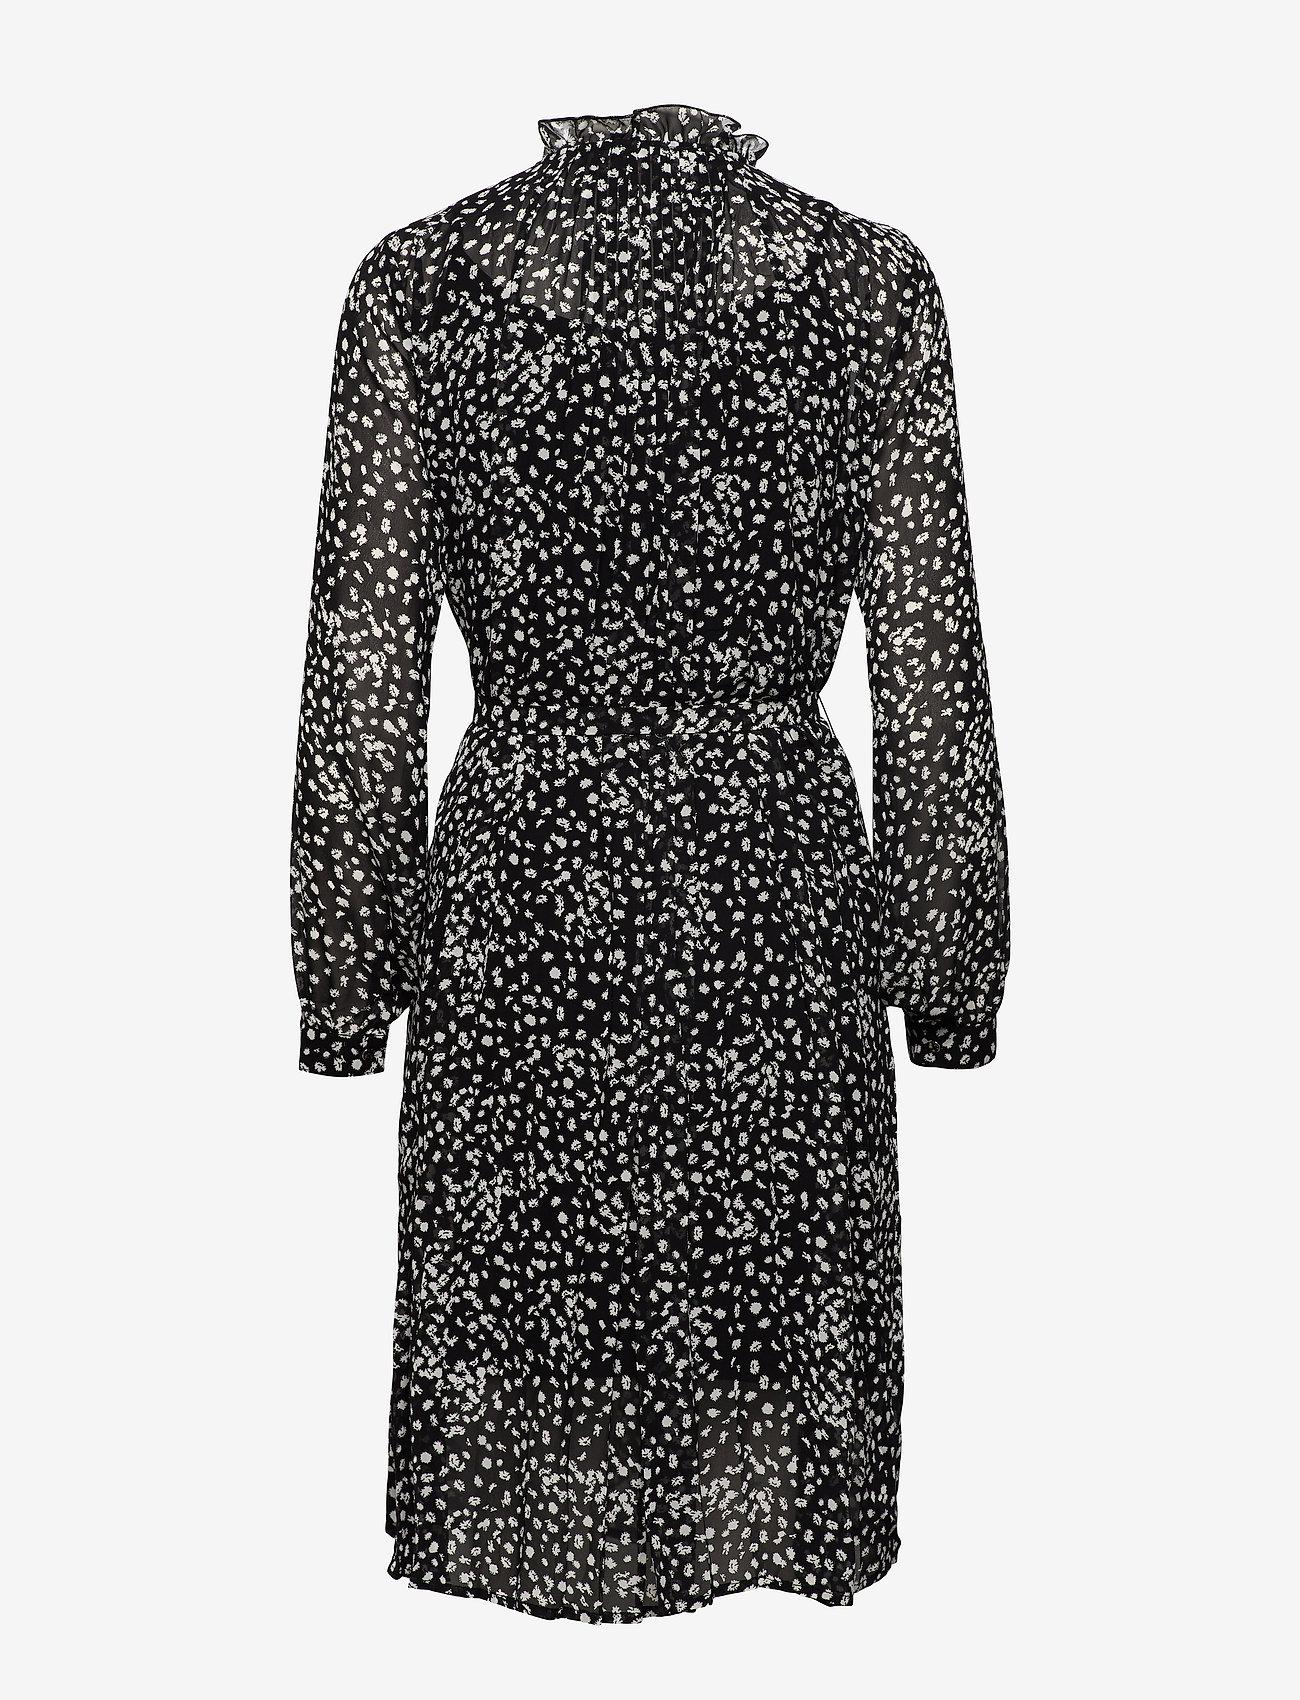 Soft Rebels Sally LS Dress print - Sukienki FLORA MONOCROME PRINT - Kobiety Odzież.